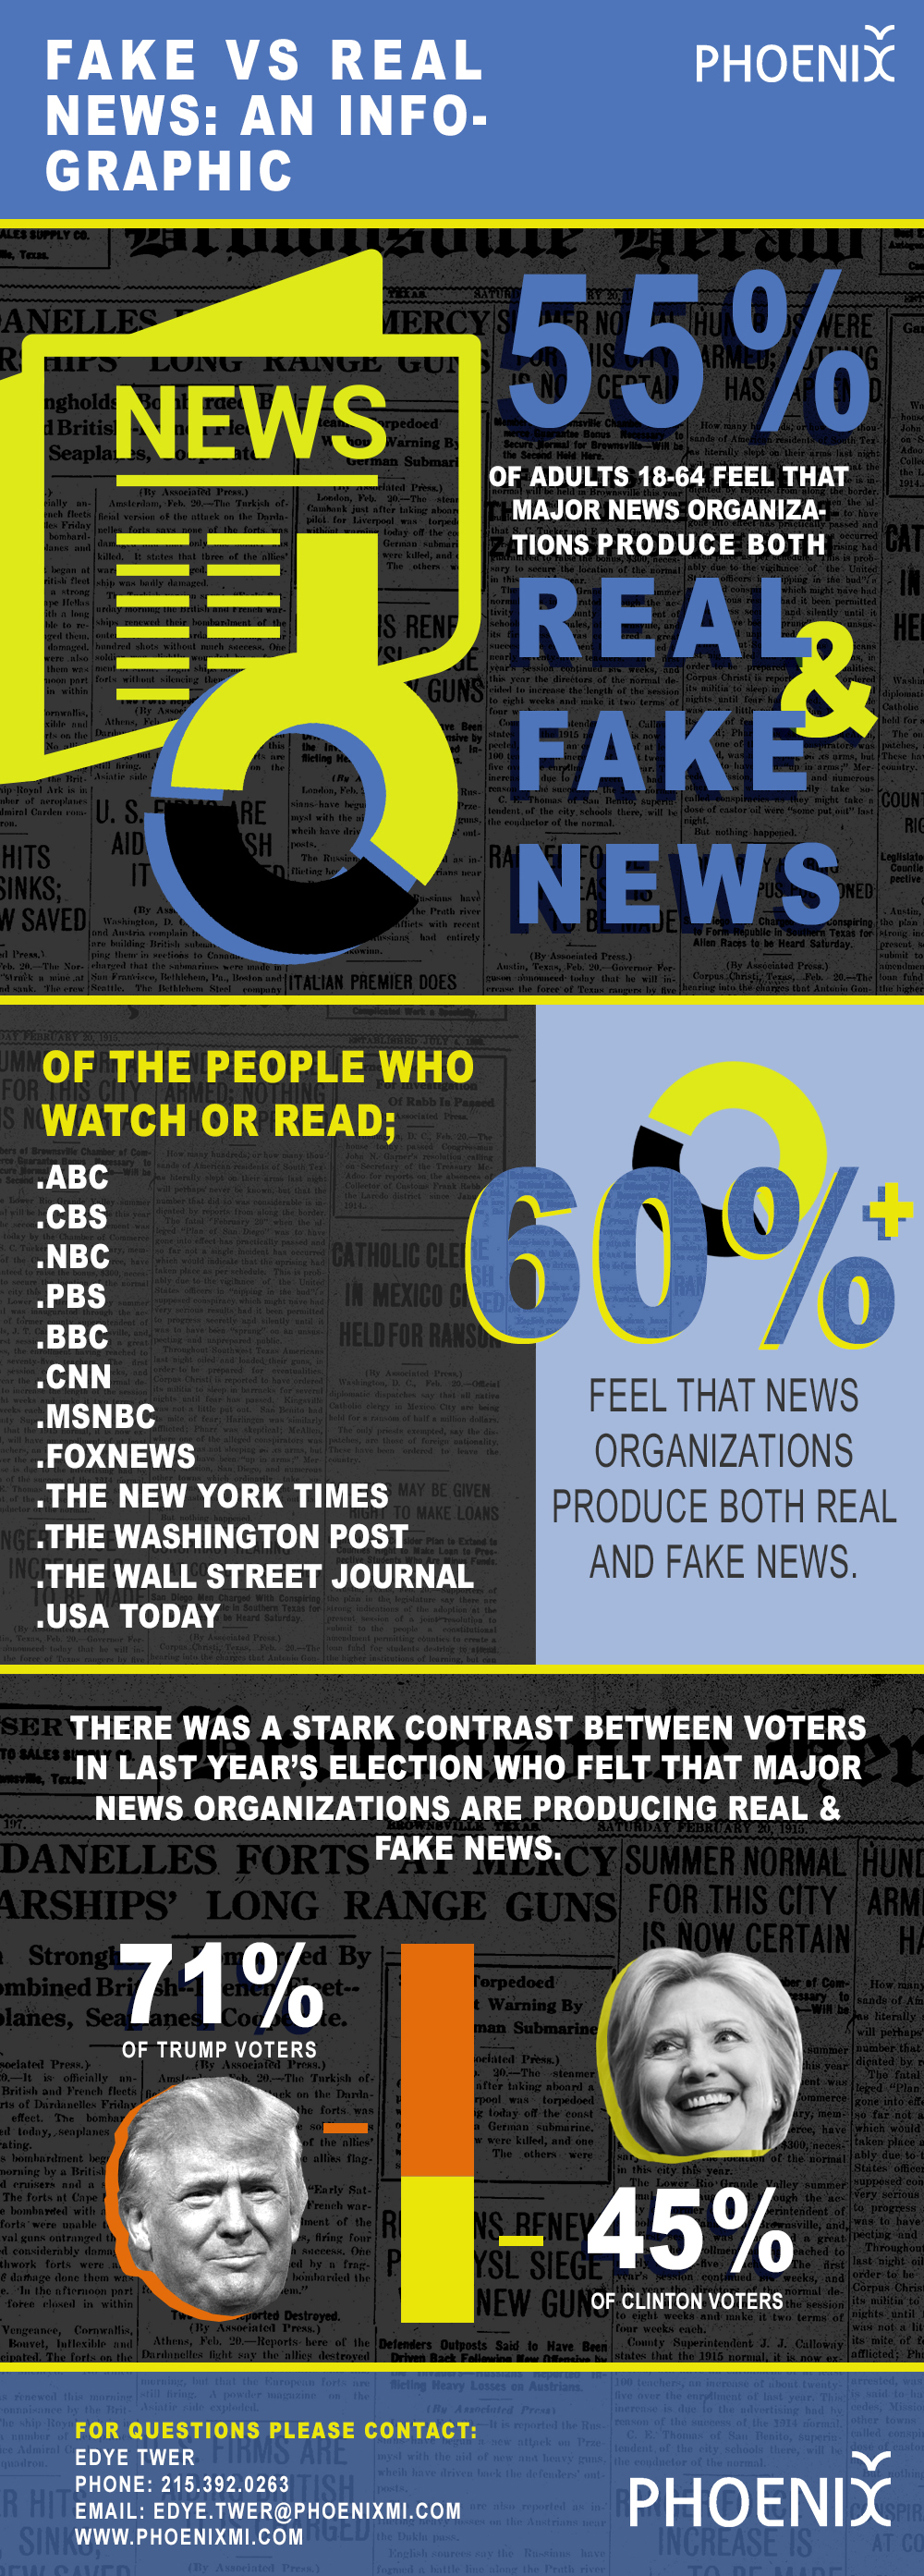 Fake News Infographic